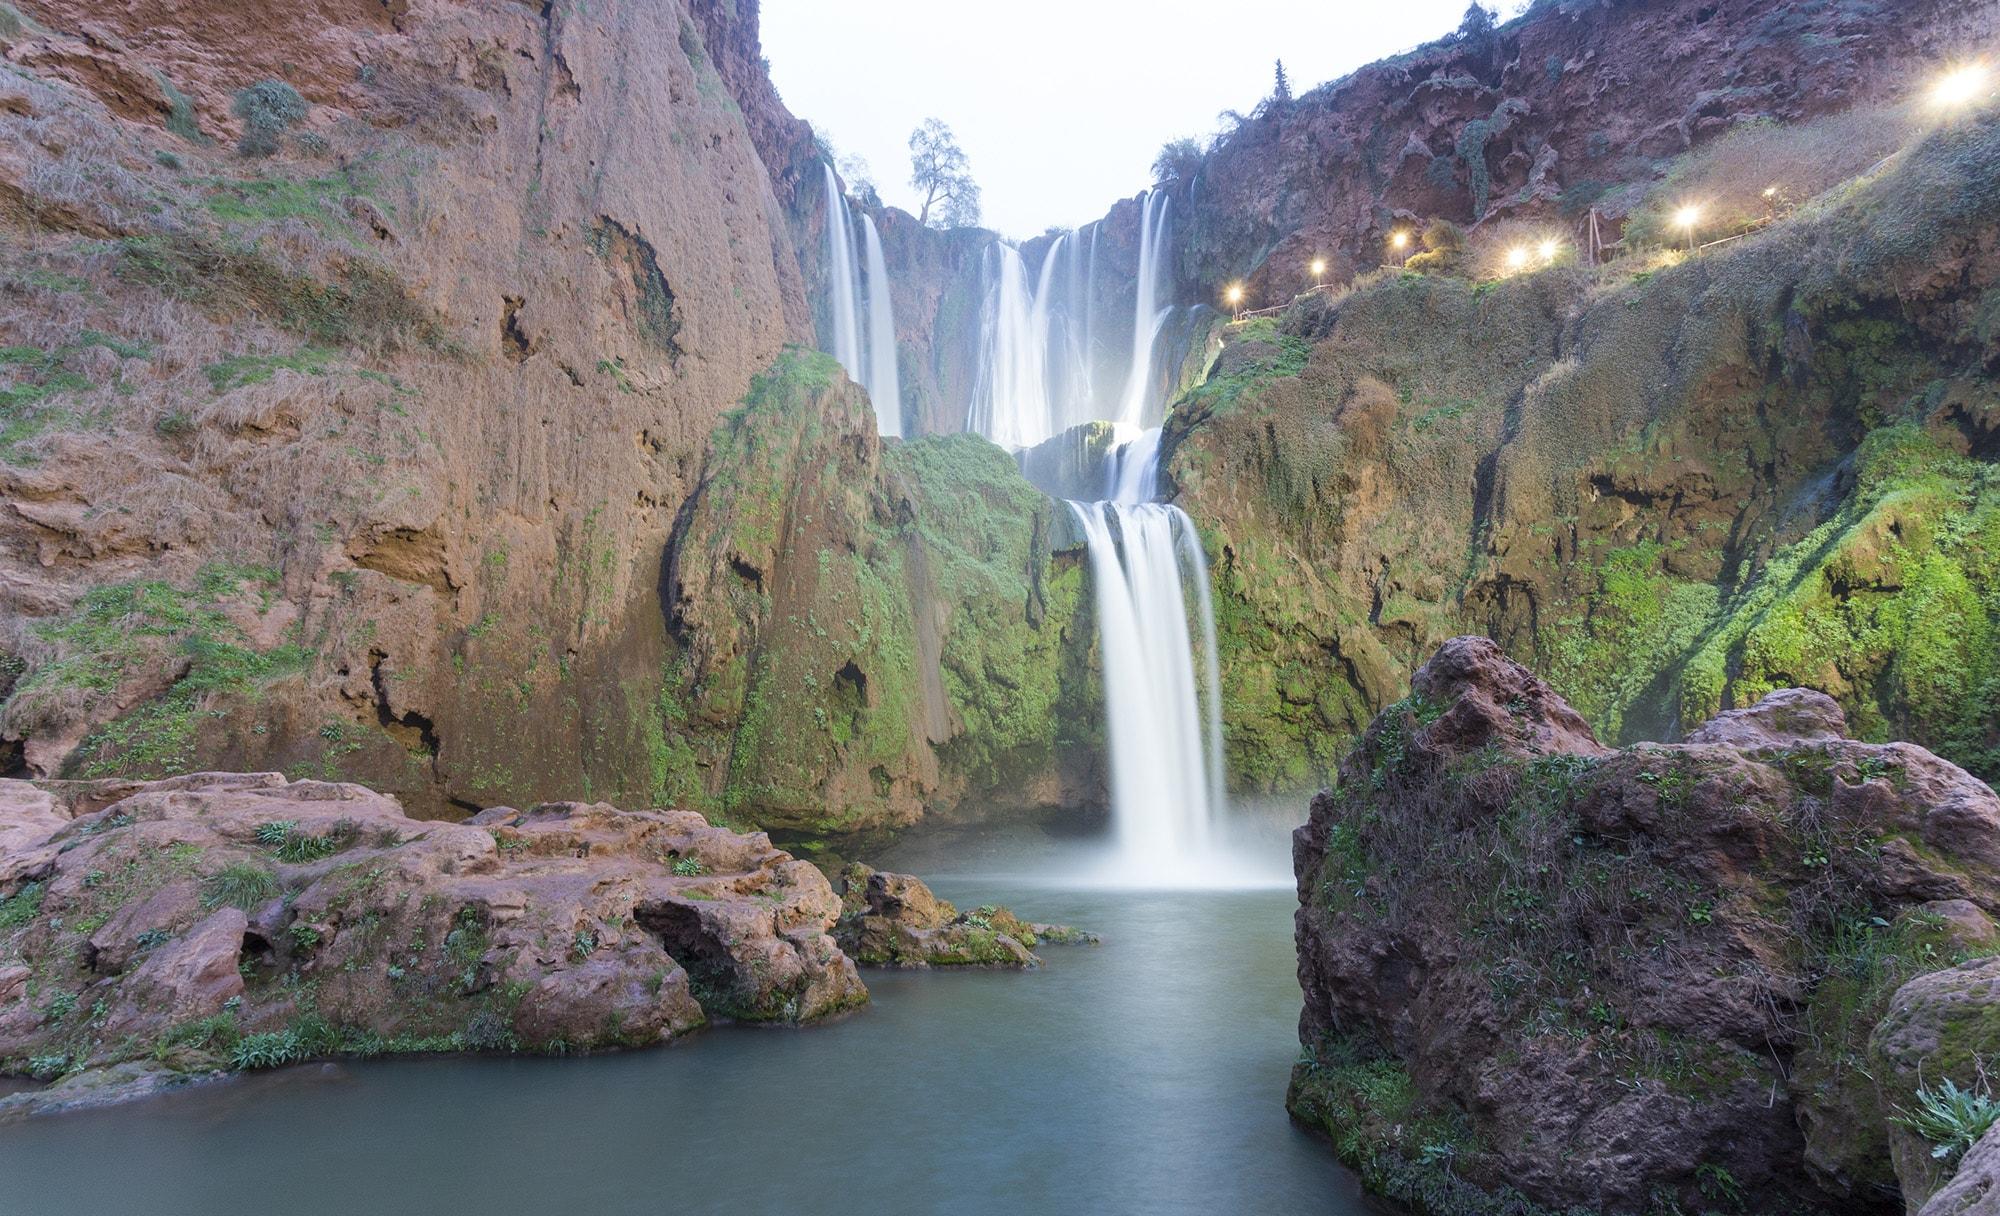 https://moroccodestinationtours.com/wp-content/uploads/2018/03/morocco-destination-tours-ouzoud.jpg